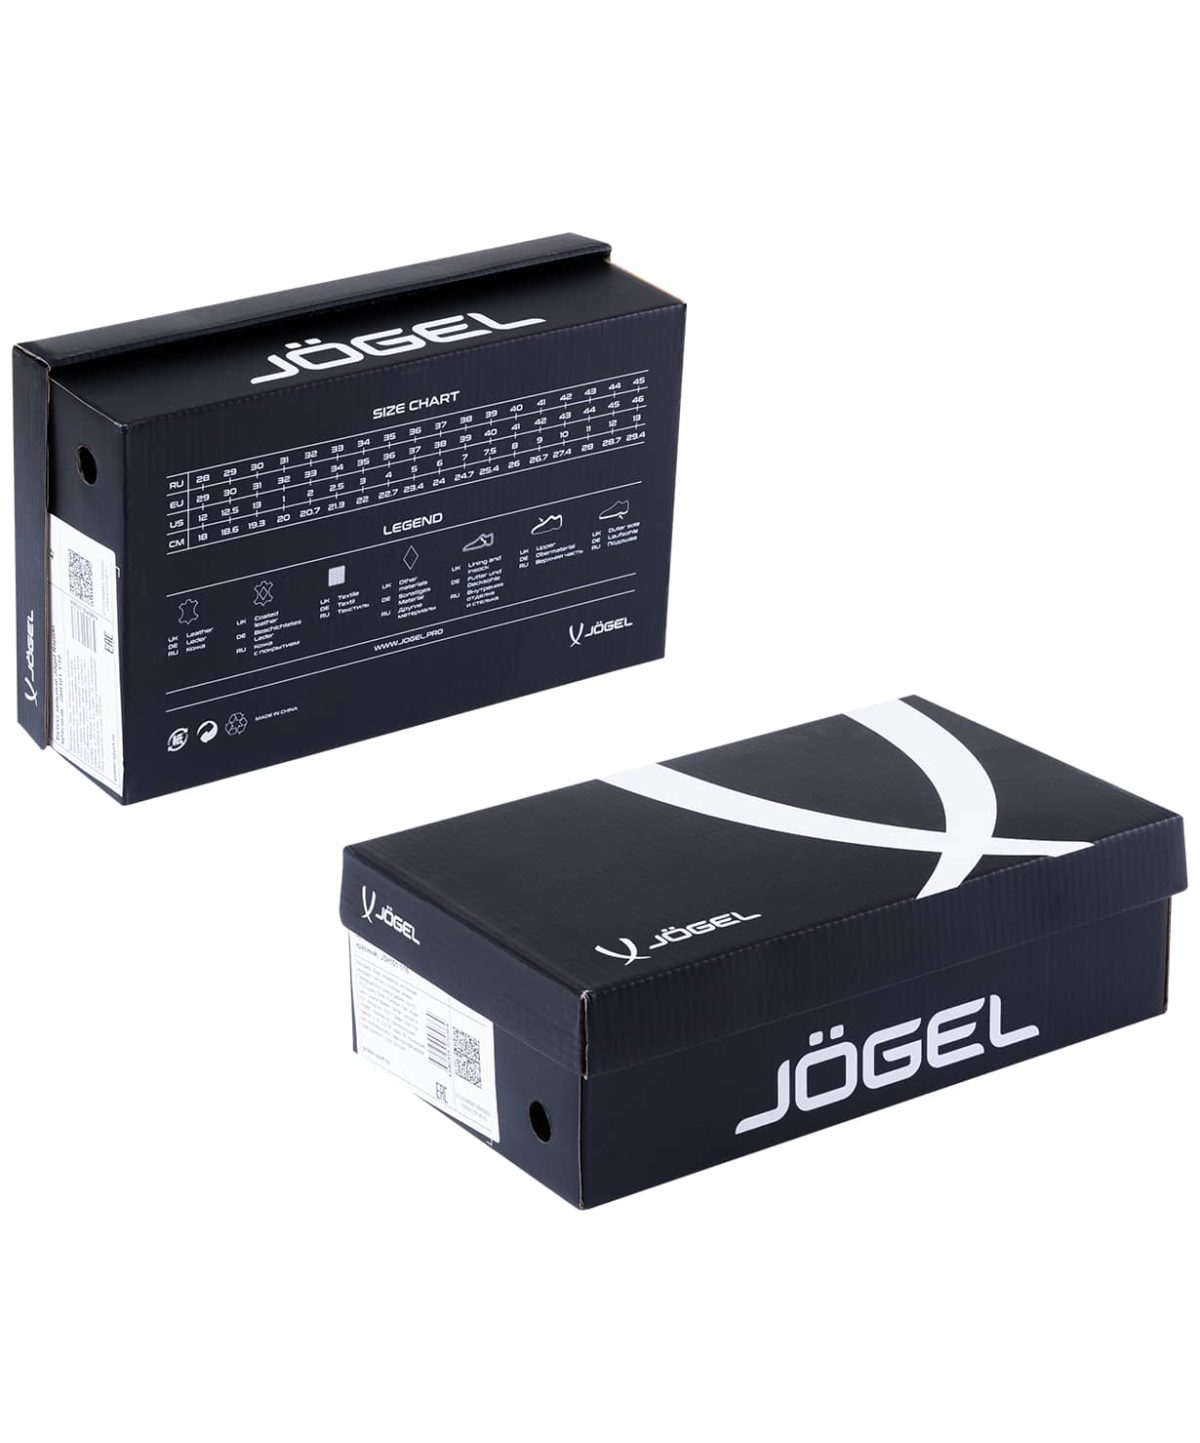 JOGEL Бутсы зальные Rapido р.34-38  JSH101Y: чёрный - 2